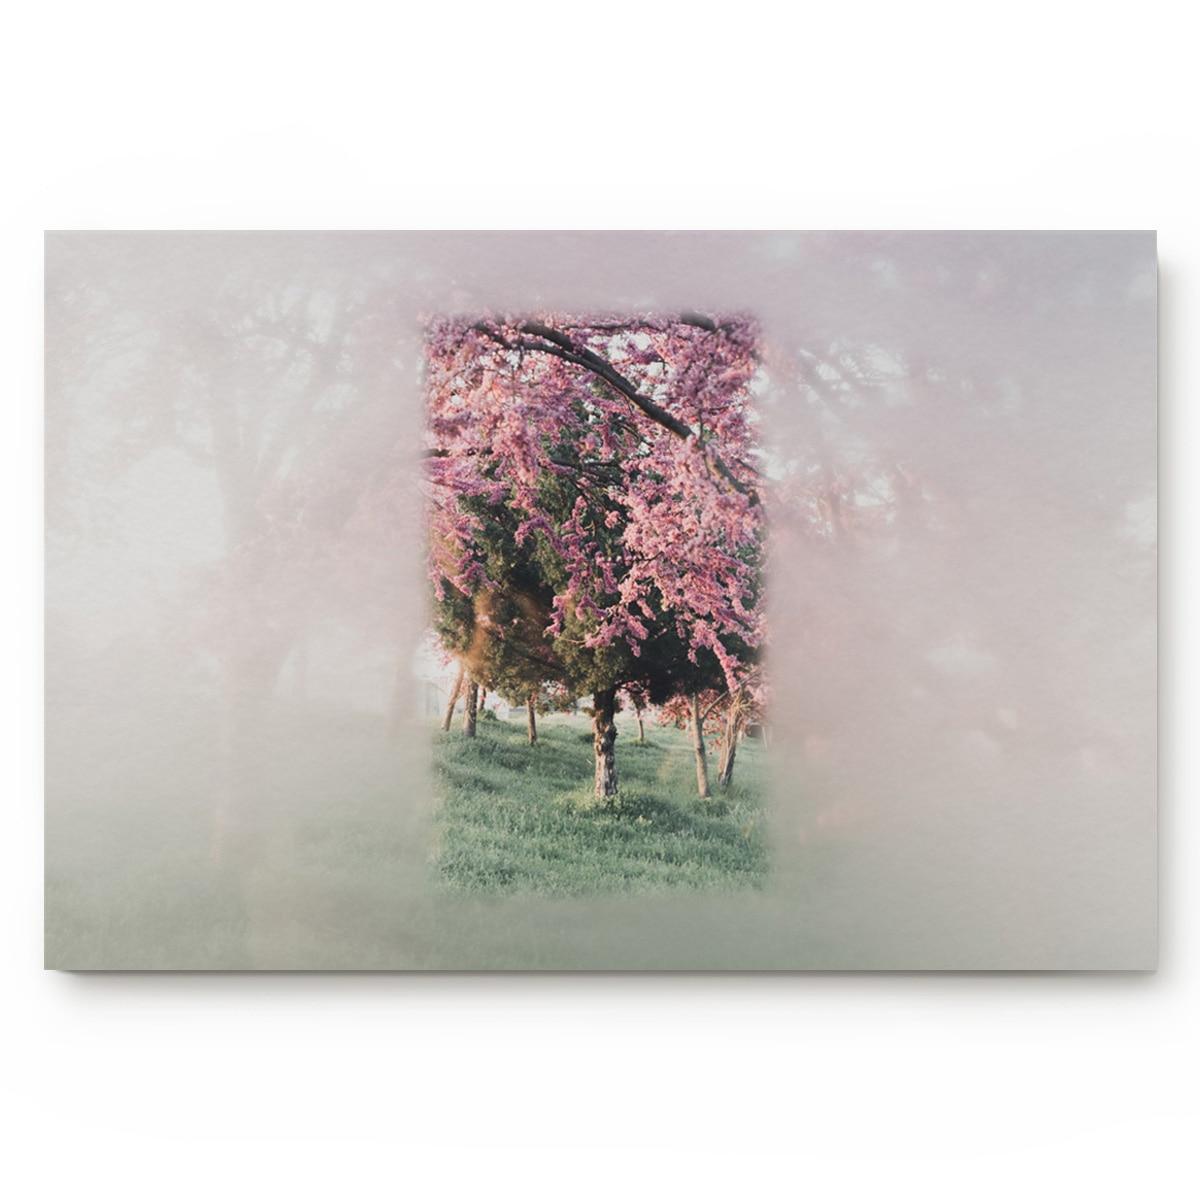 Peach Blossom Dream Summer Bathroom Non-slip Doormat Bathroom Accessories Living Room Kitchen Doormat